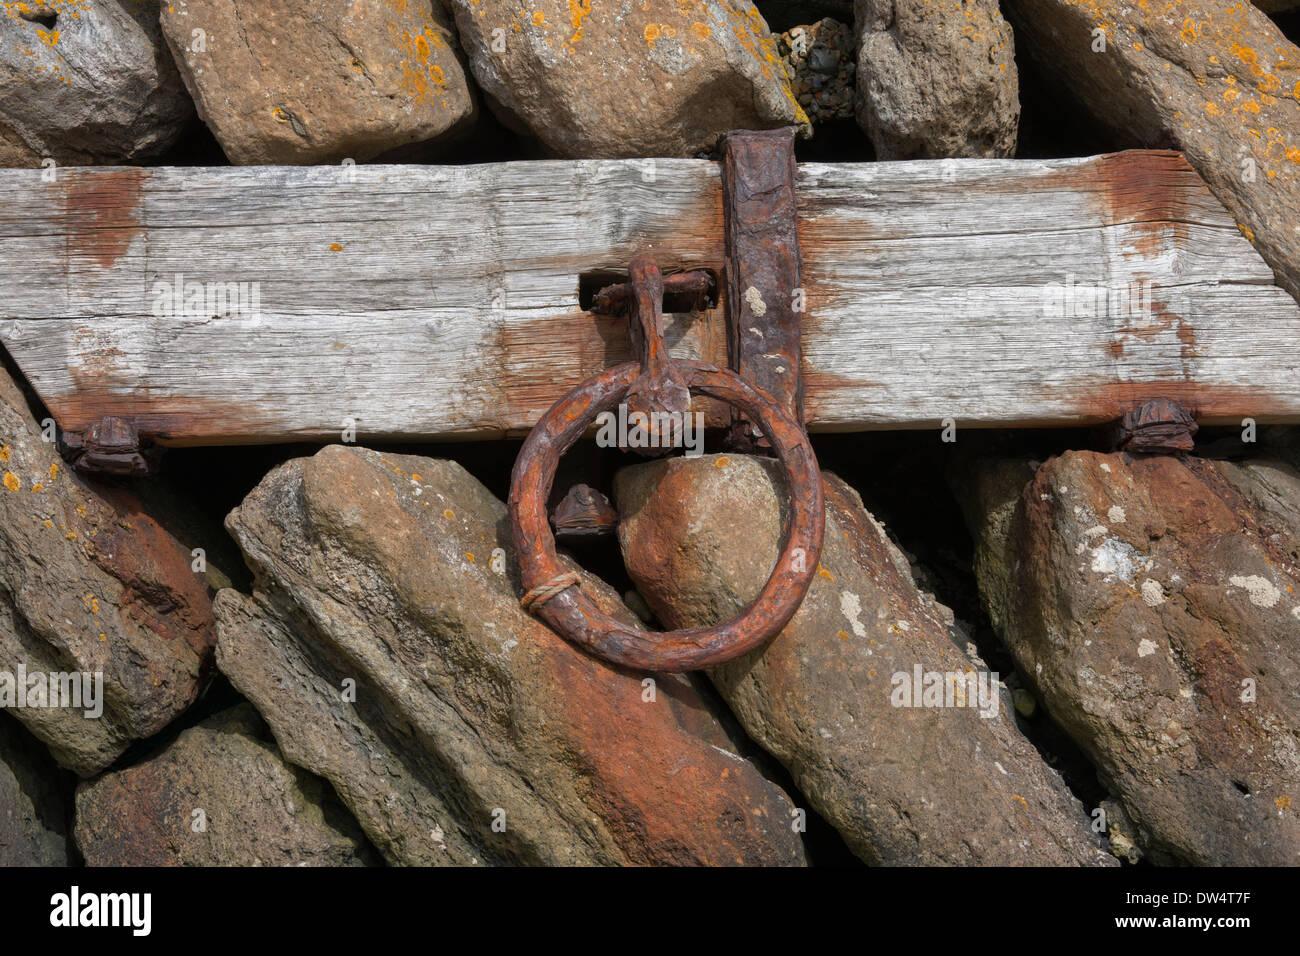 Mooring ring inset in pier, Folkestone harbour, Folkestone, Kent, England - Stock Image